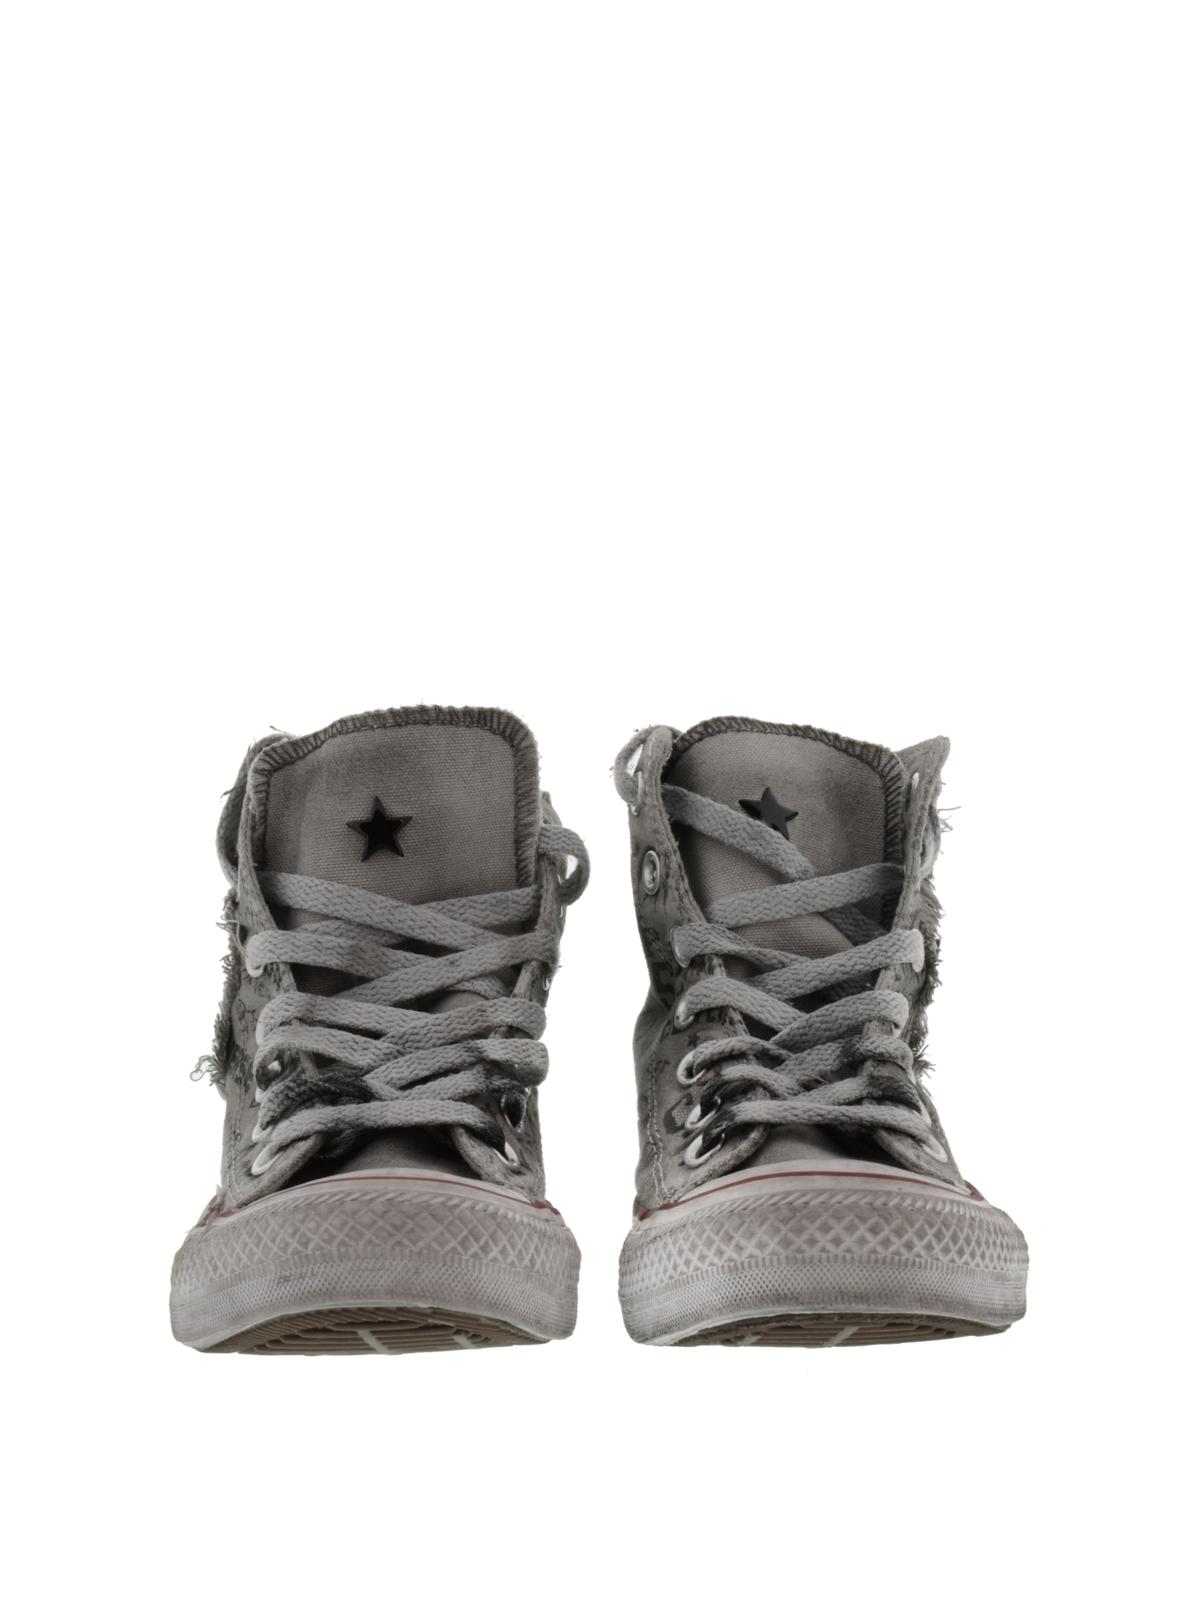 converse limited edition shop online